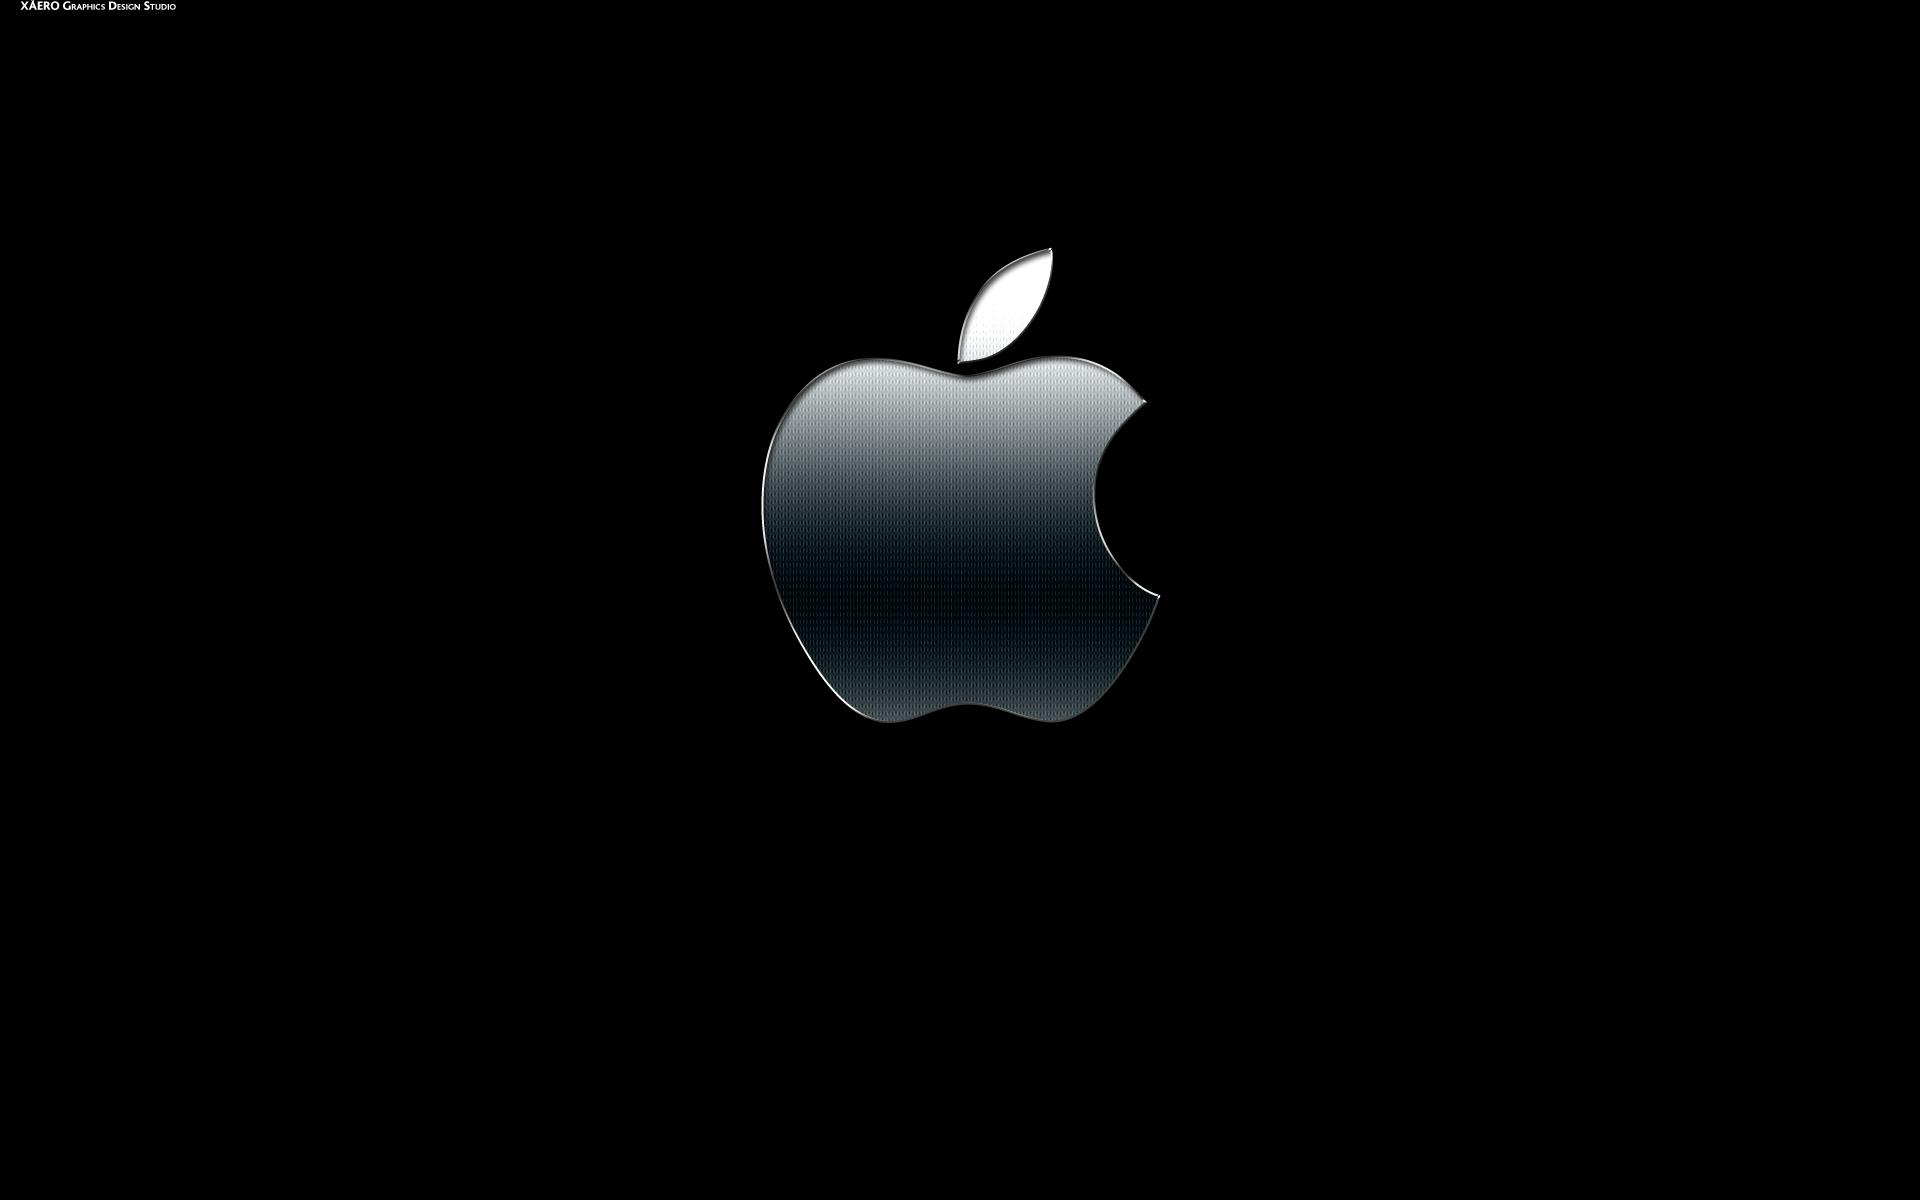 78 Apple Desktop Wallpapers On Wallpapersafari